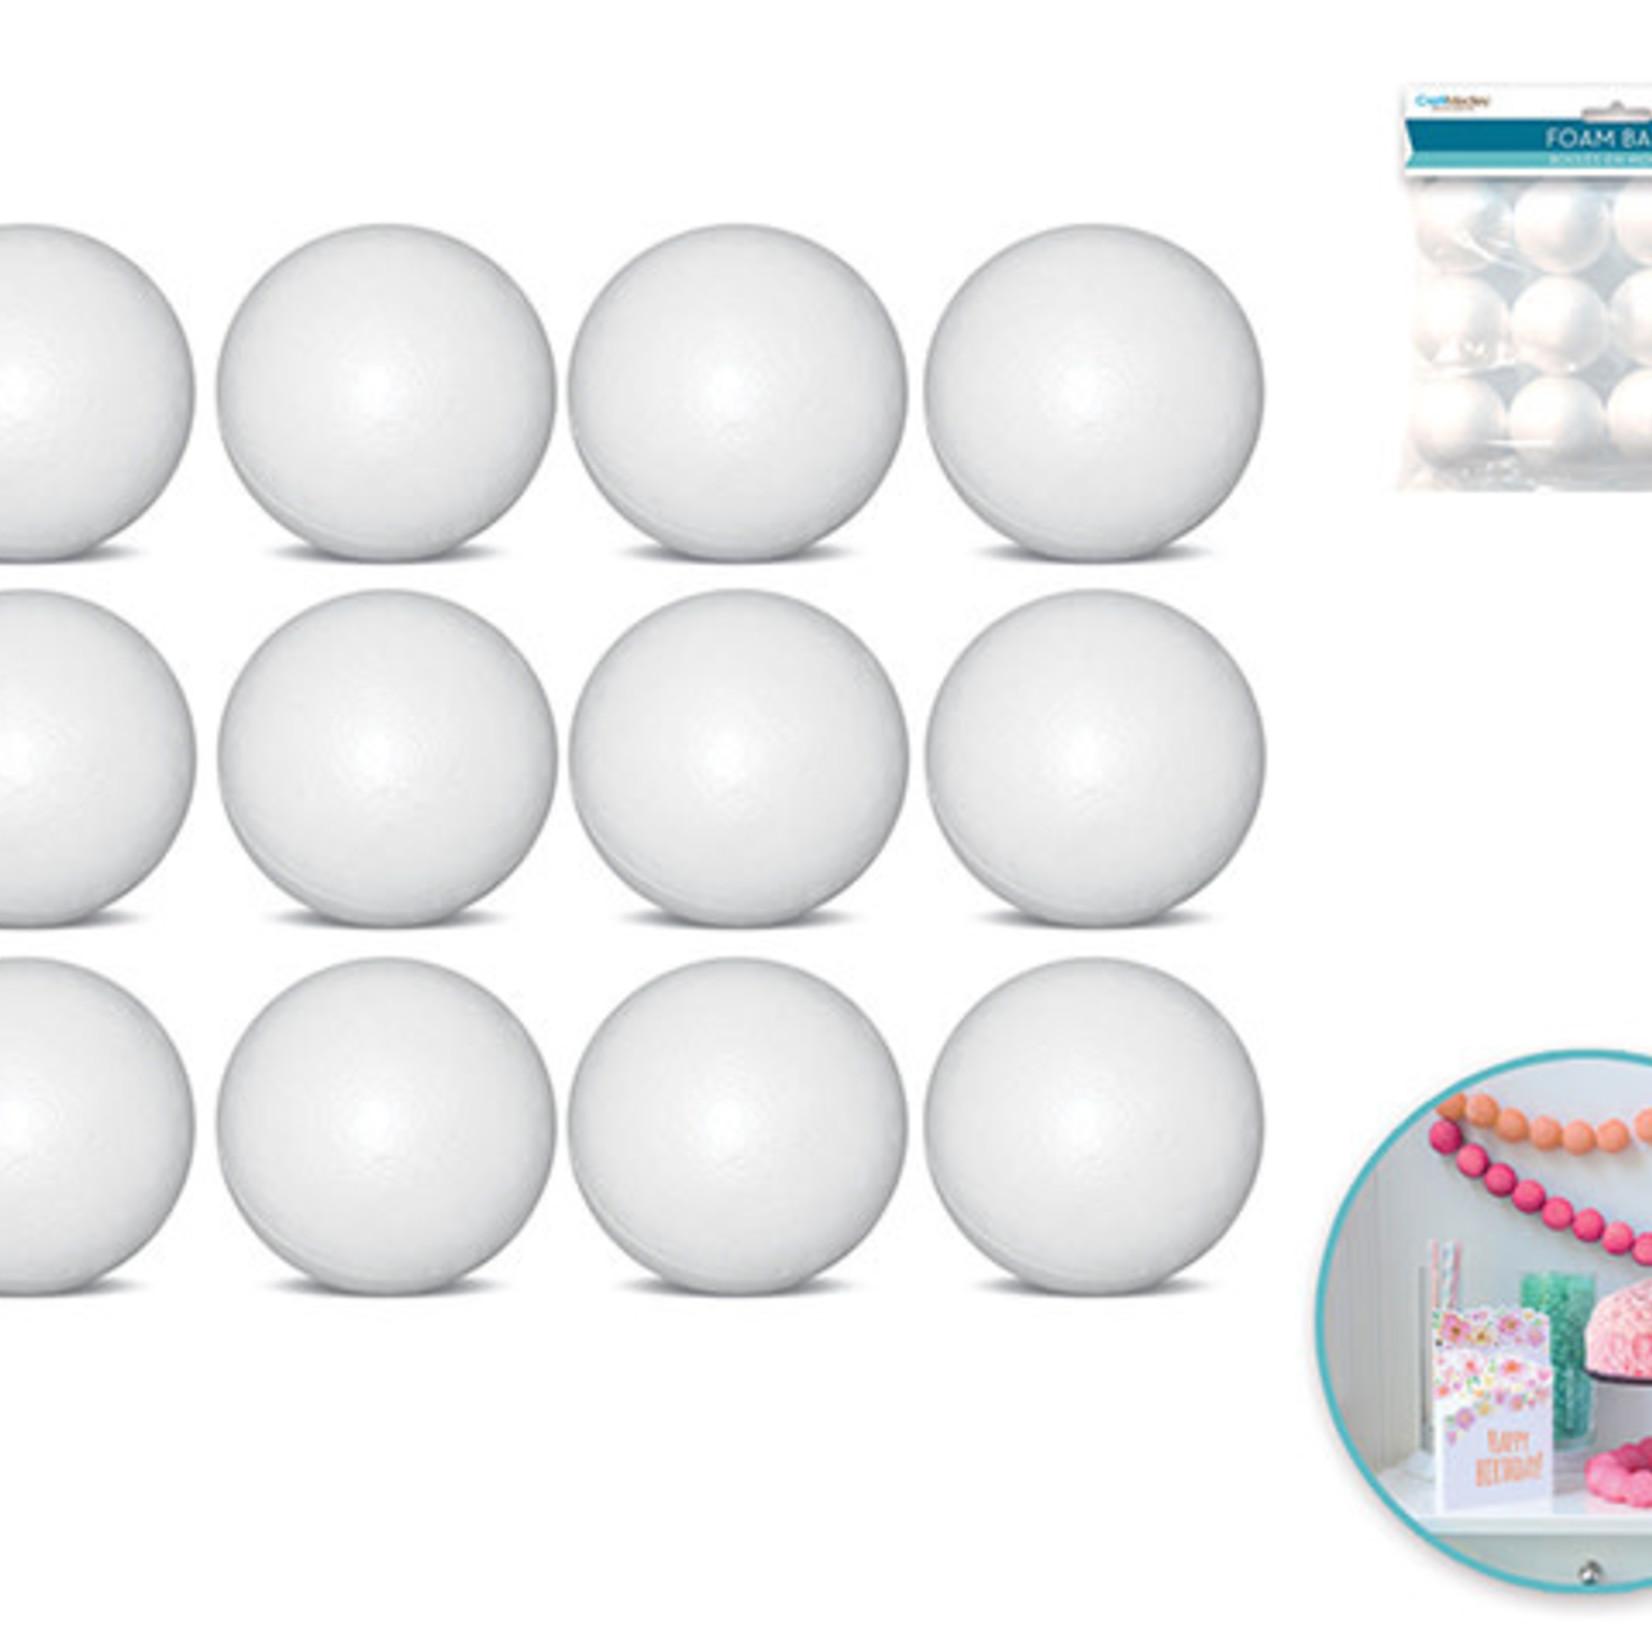 "Ployfoam Balls - 12 pack of 1.5"""